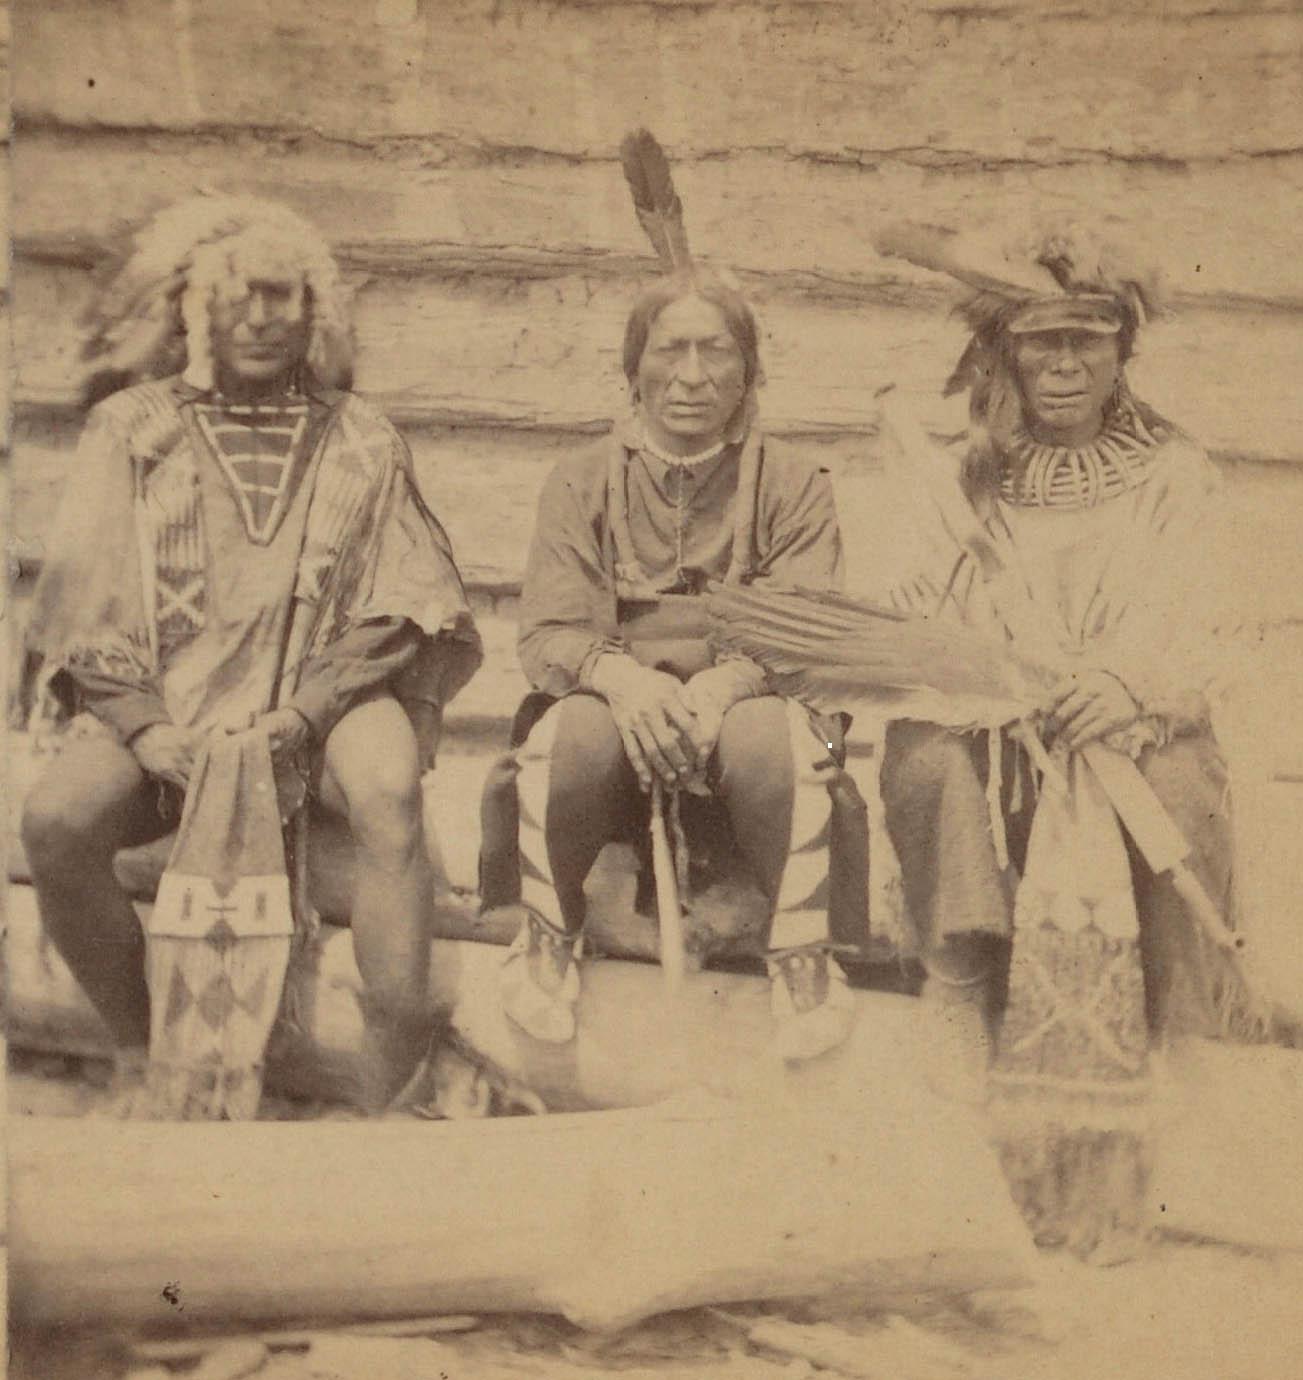 http://www.american-tribes.com/messageboards/dietmar/Morrow4.jpg